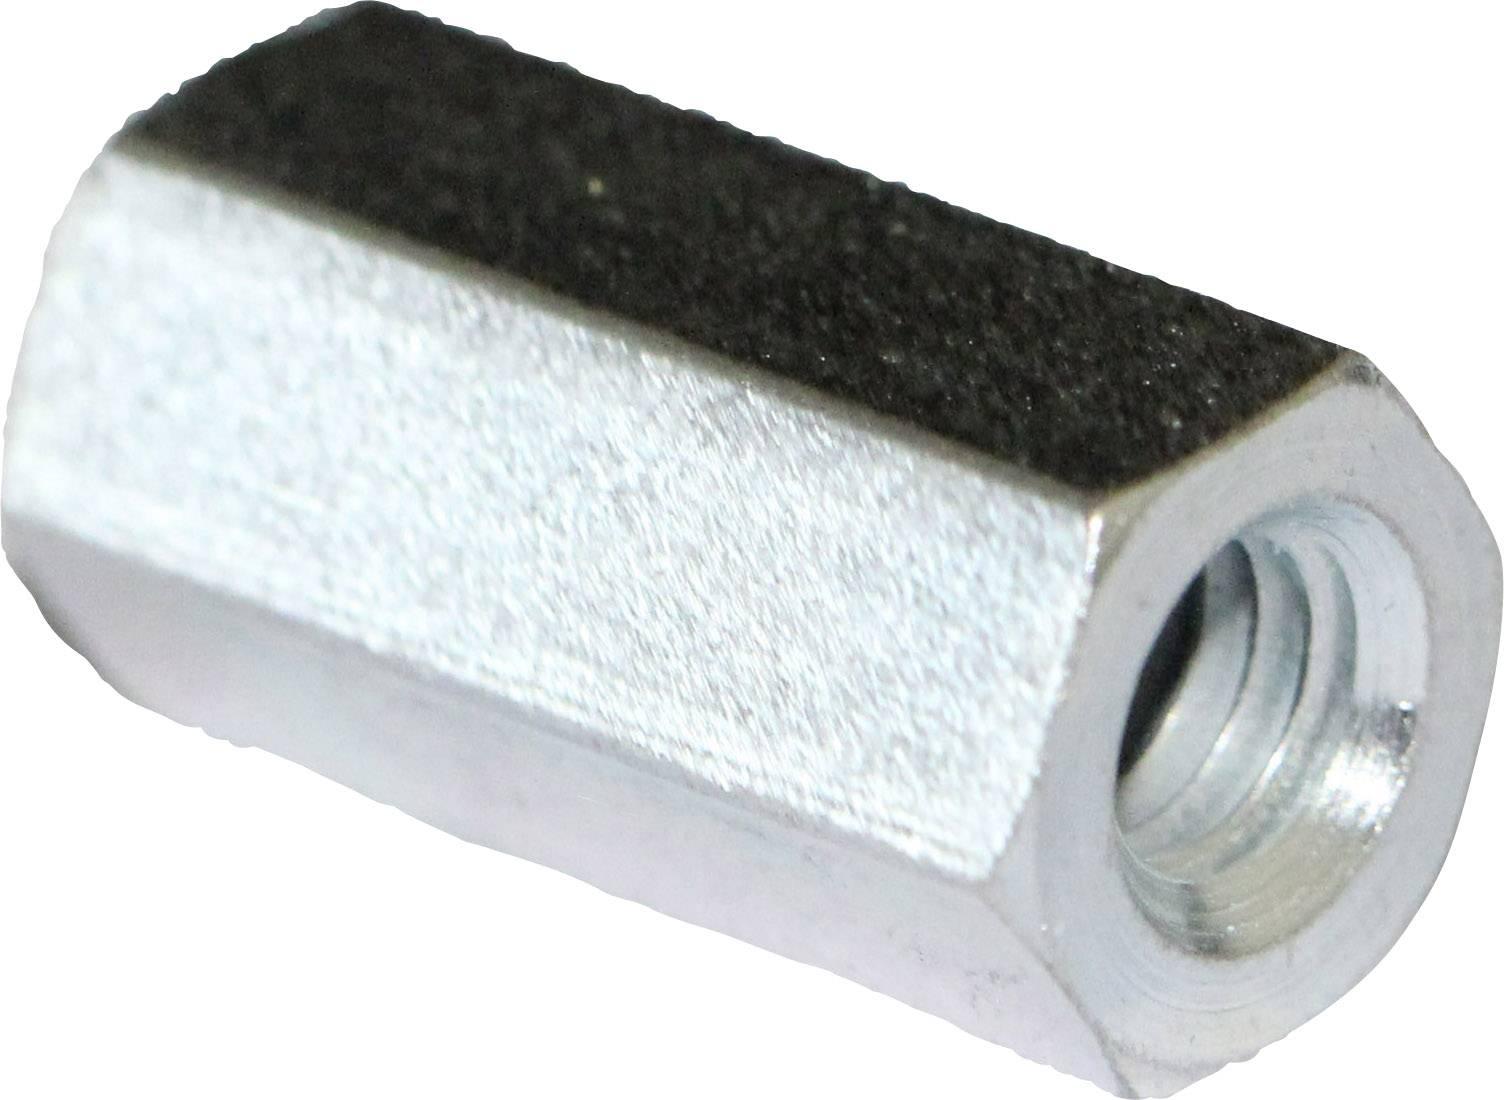 Distanční sloupek PB Fastener S58050X45, M5, 45 mm, 10 ks